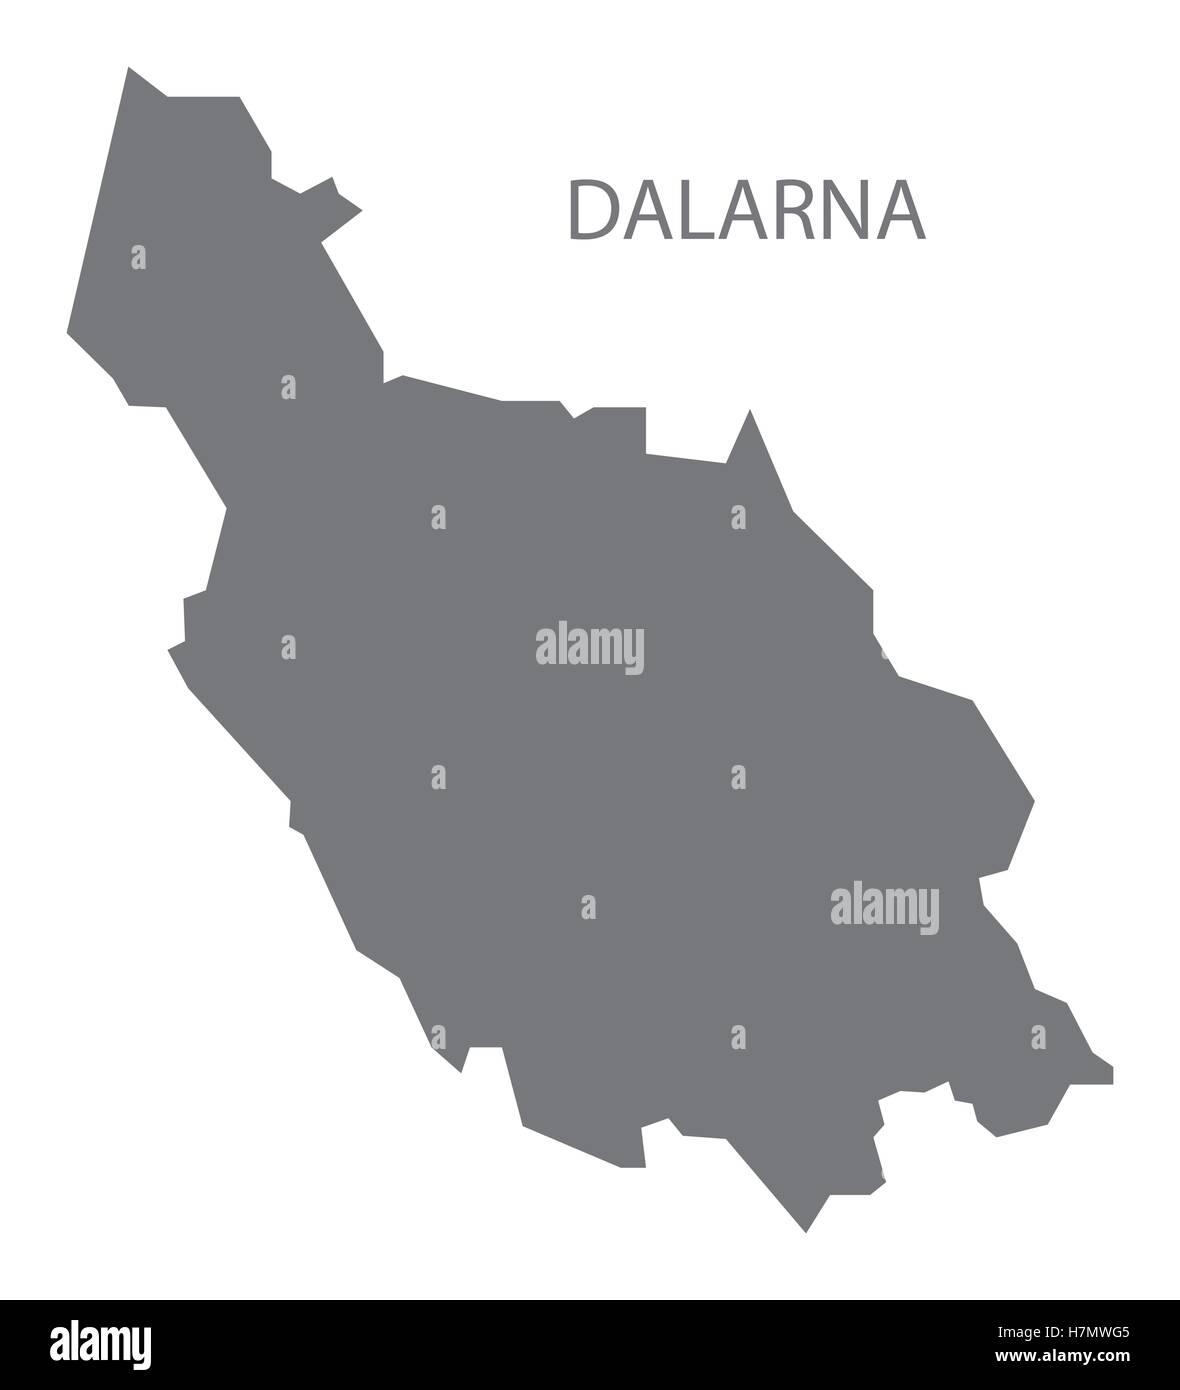 Dalarna Sweden Map grey - Stock Image